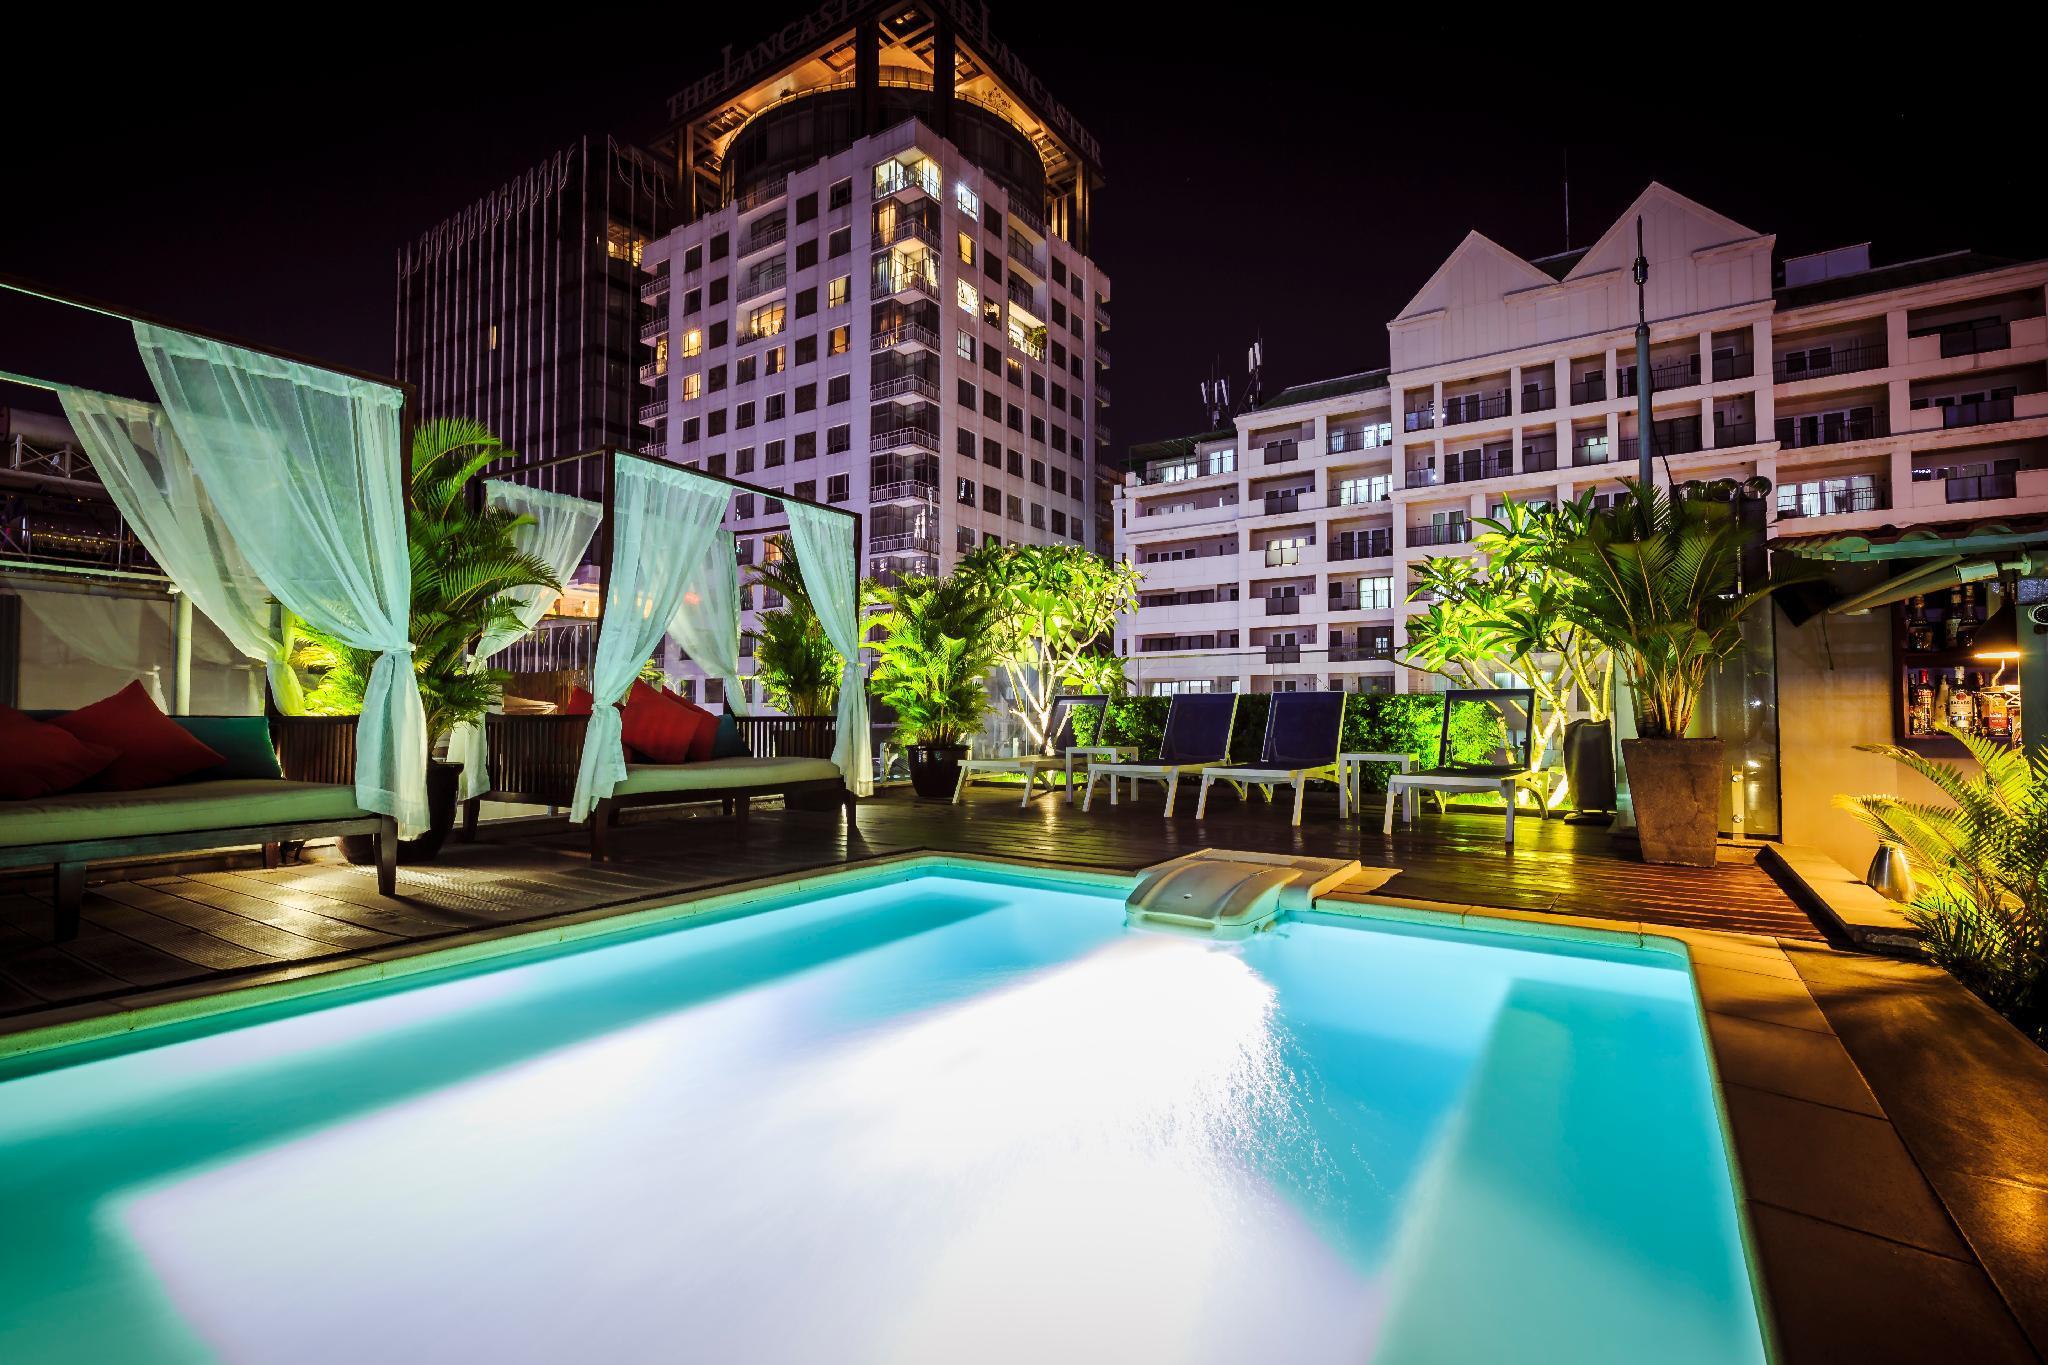 Roseland Centa Hotel And Spa